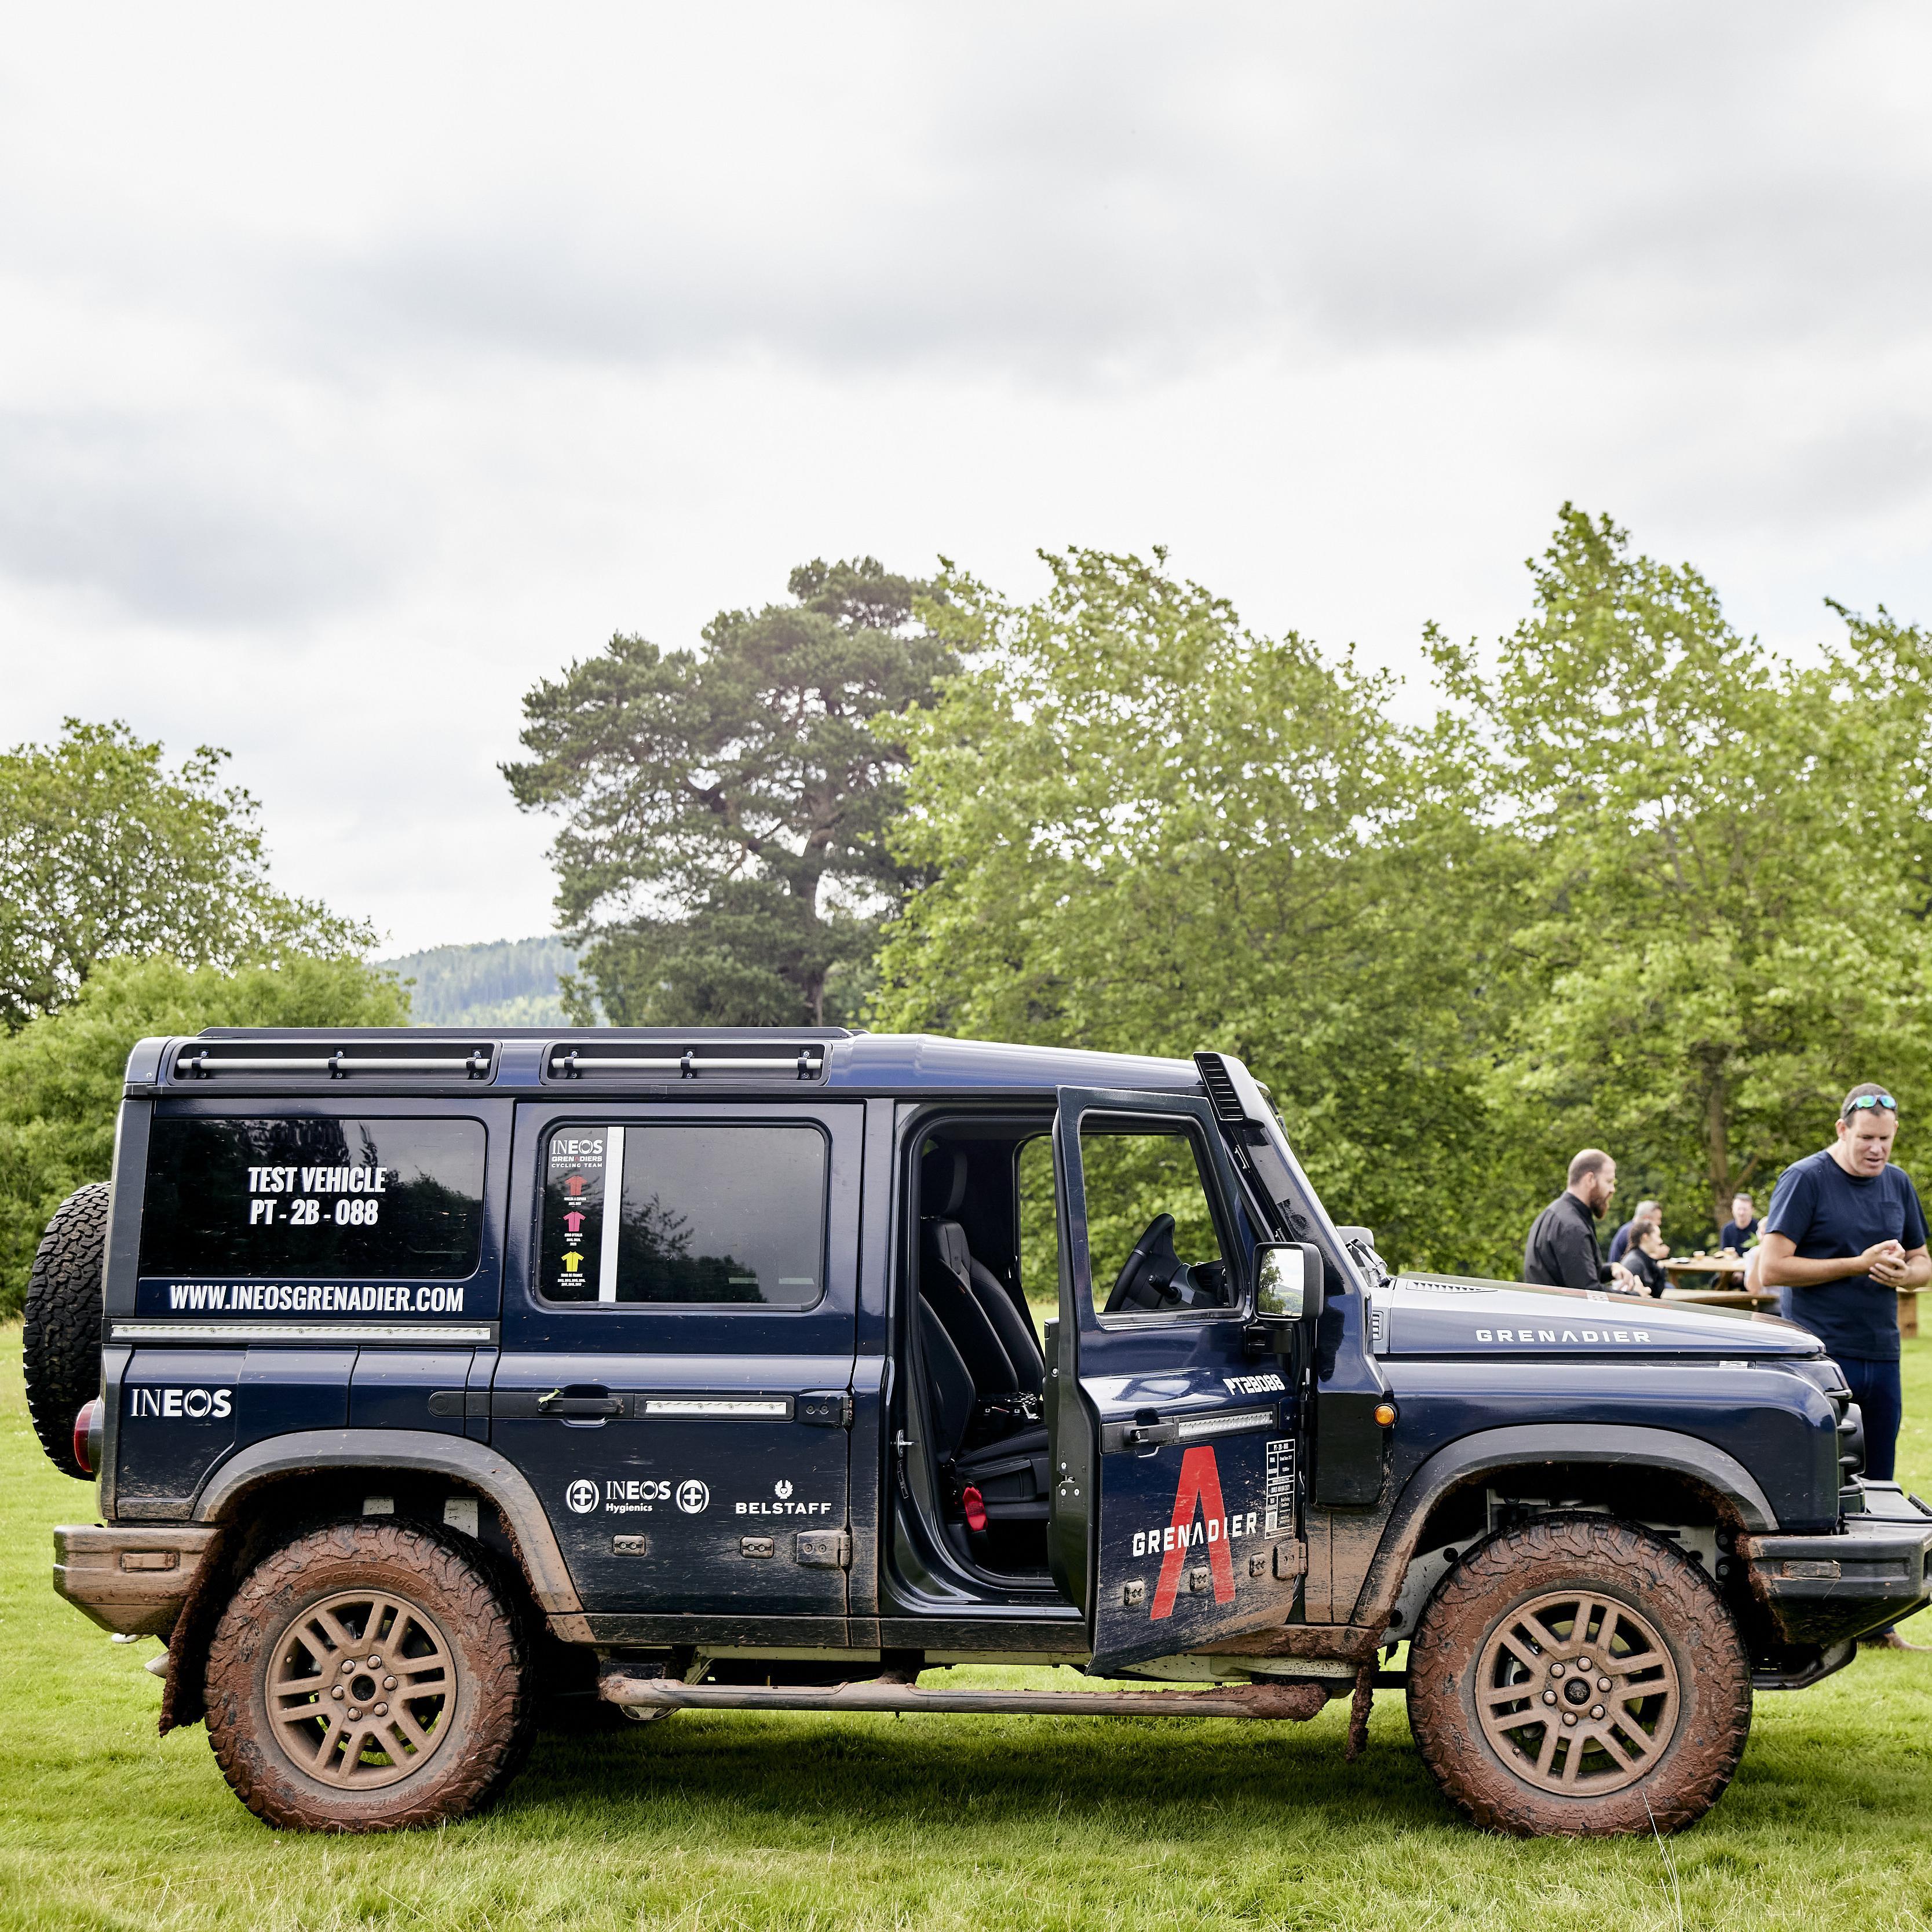 The Grenadier 2B Prototype Tour: Glanusk, Wales